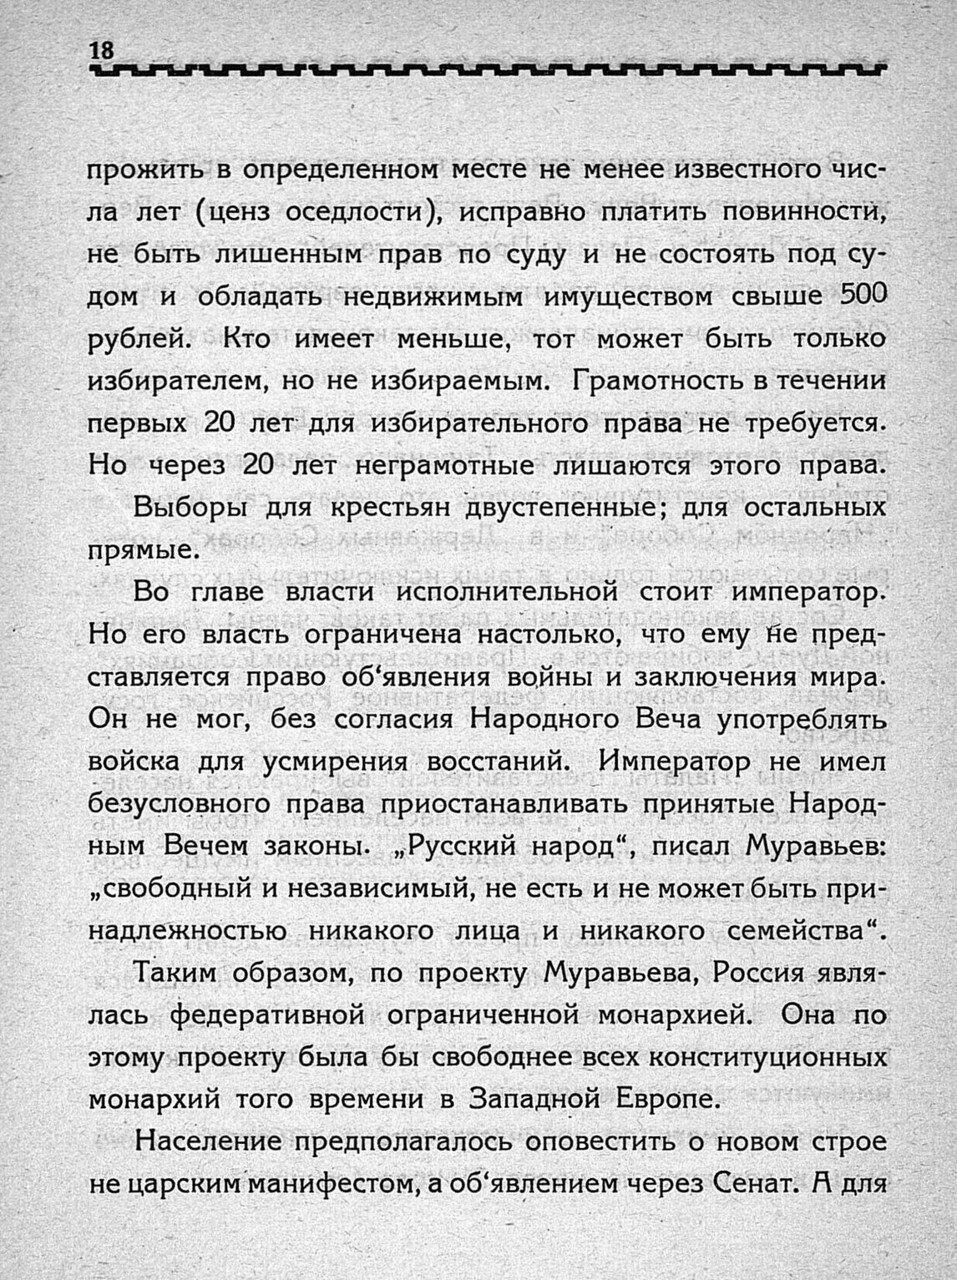 https://img-fotki.yandex.ru/get/45443/199368979.23/0_1bfad6_41d146a6_XXXL.jpg